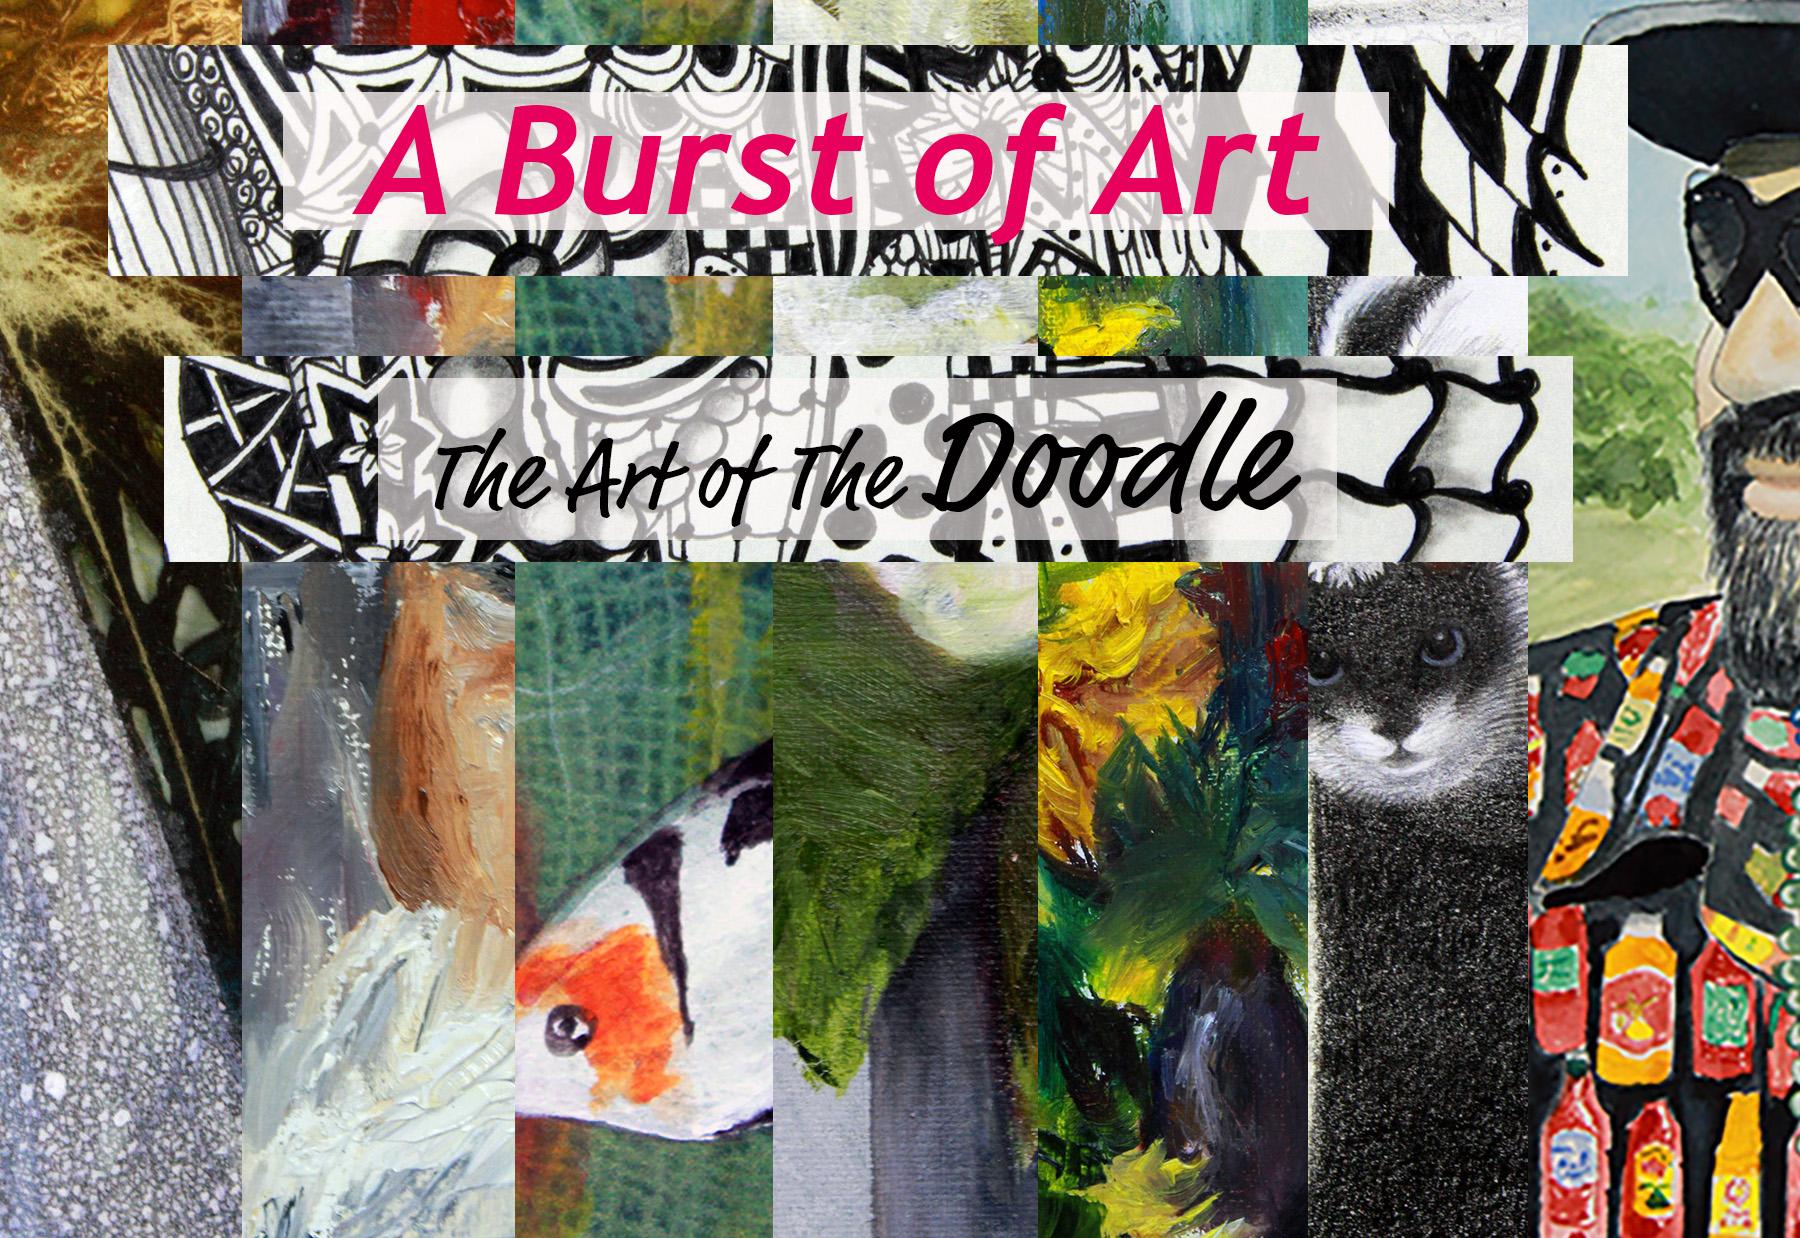 Burst of Art & Art of the Doodle